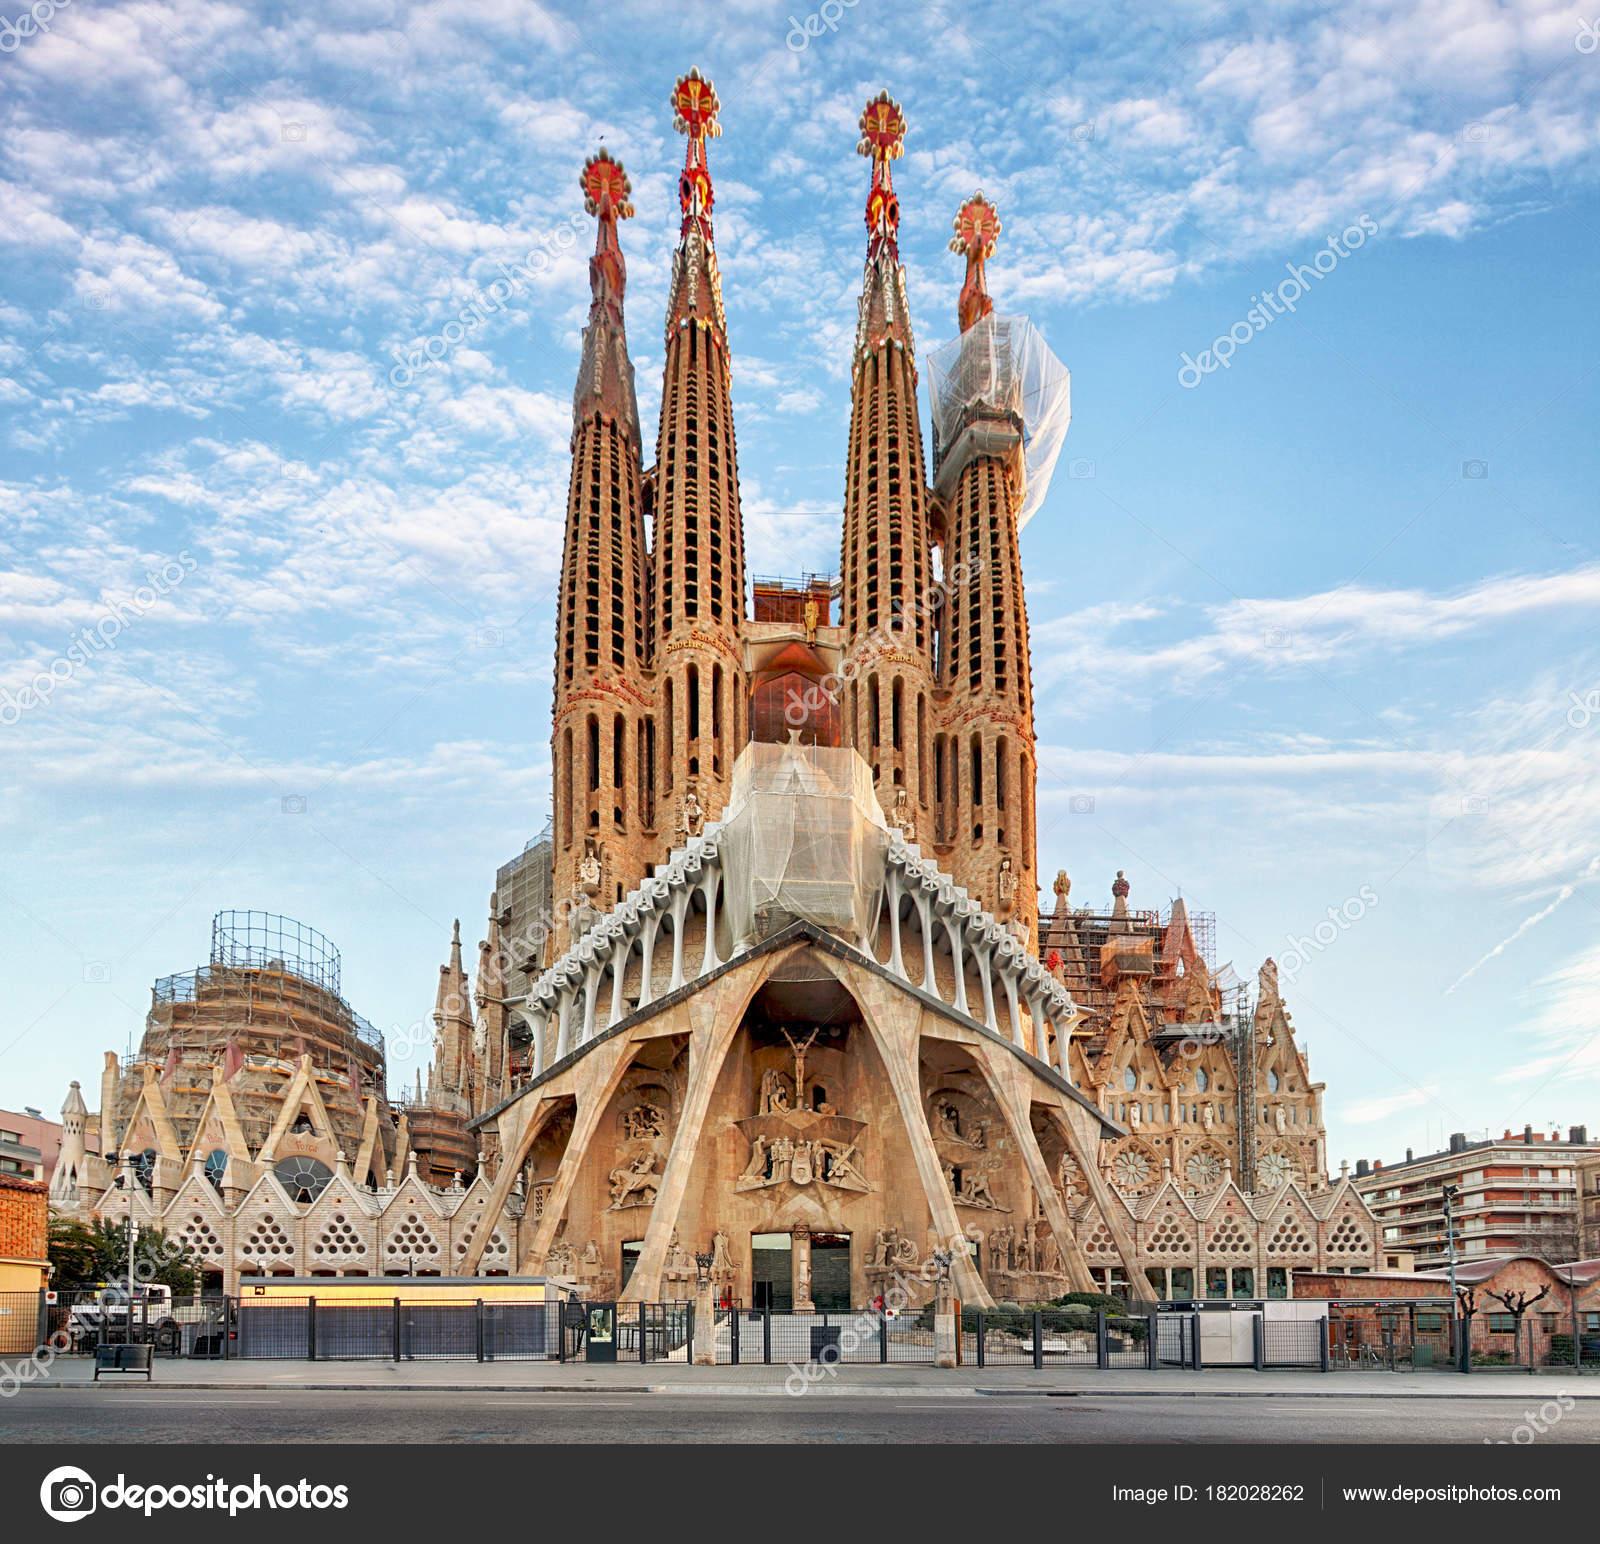 BARCELONA, SPAIN - FEBRUARY 10: La Sagrada Familia - the impress ...